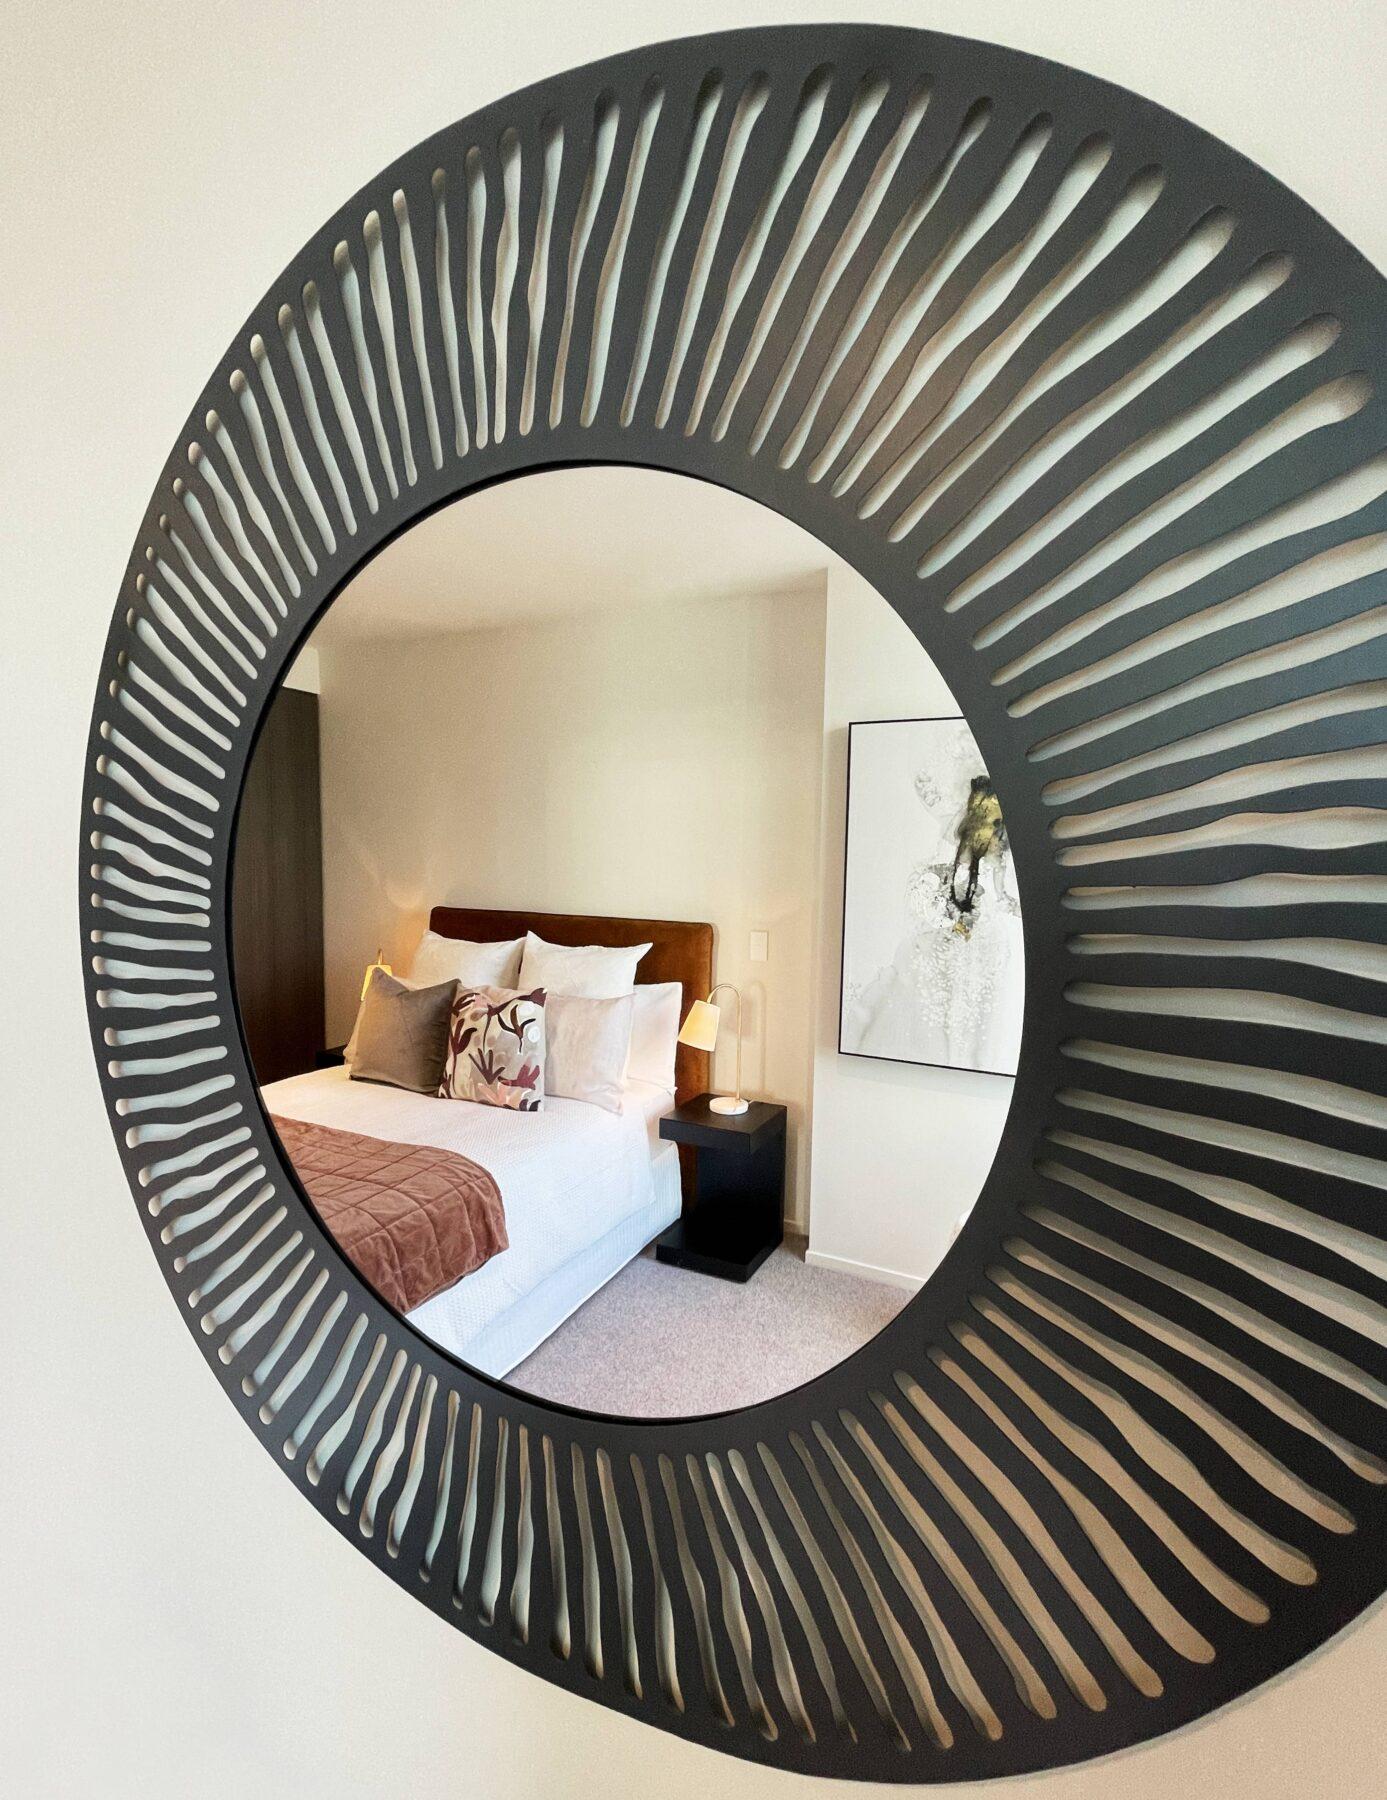 luxury bedroom with rust velvet headboard, black bedside tables, reflection in textured black metal framed round mirror